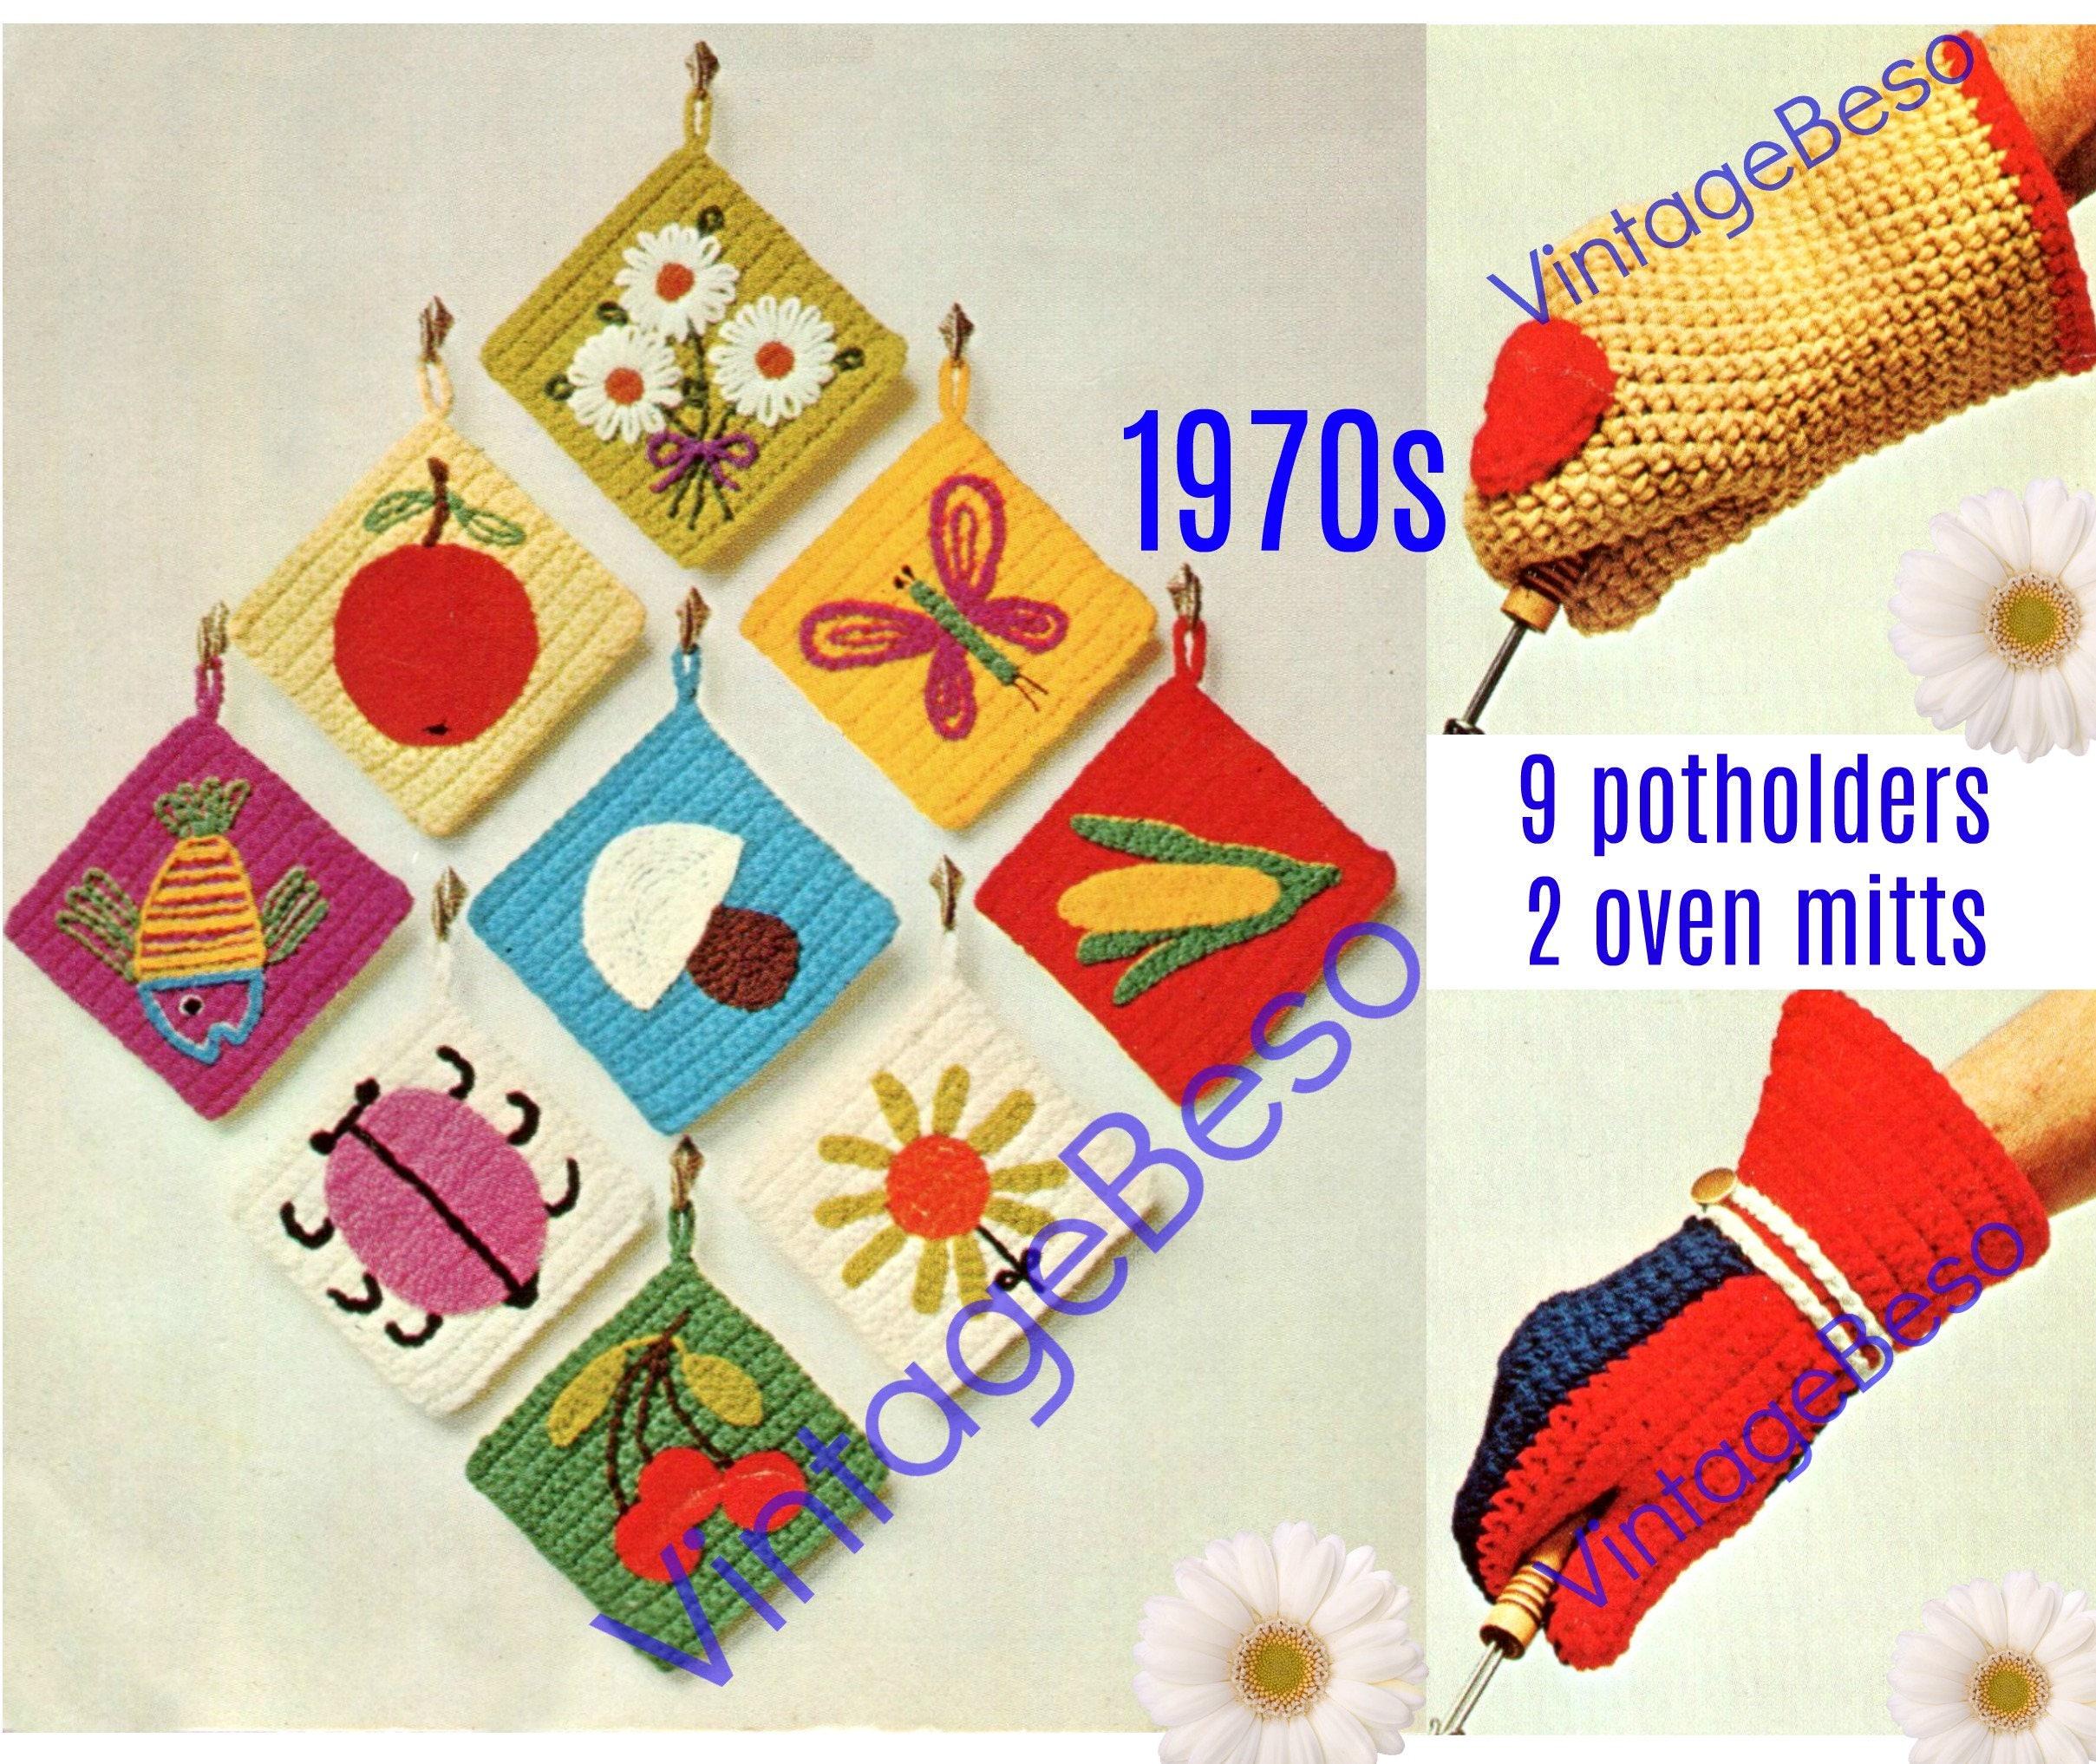 9 Potholders And 2 Oven Mitts Potholder Crochet Pattern Etsy